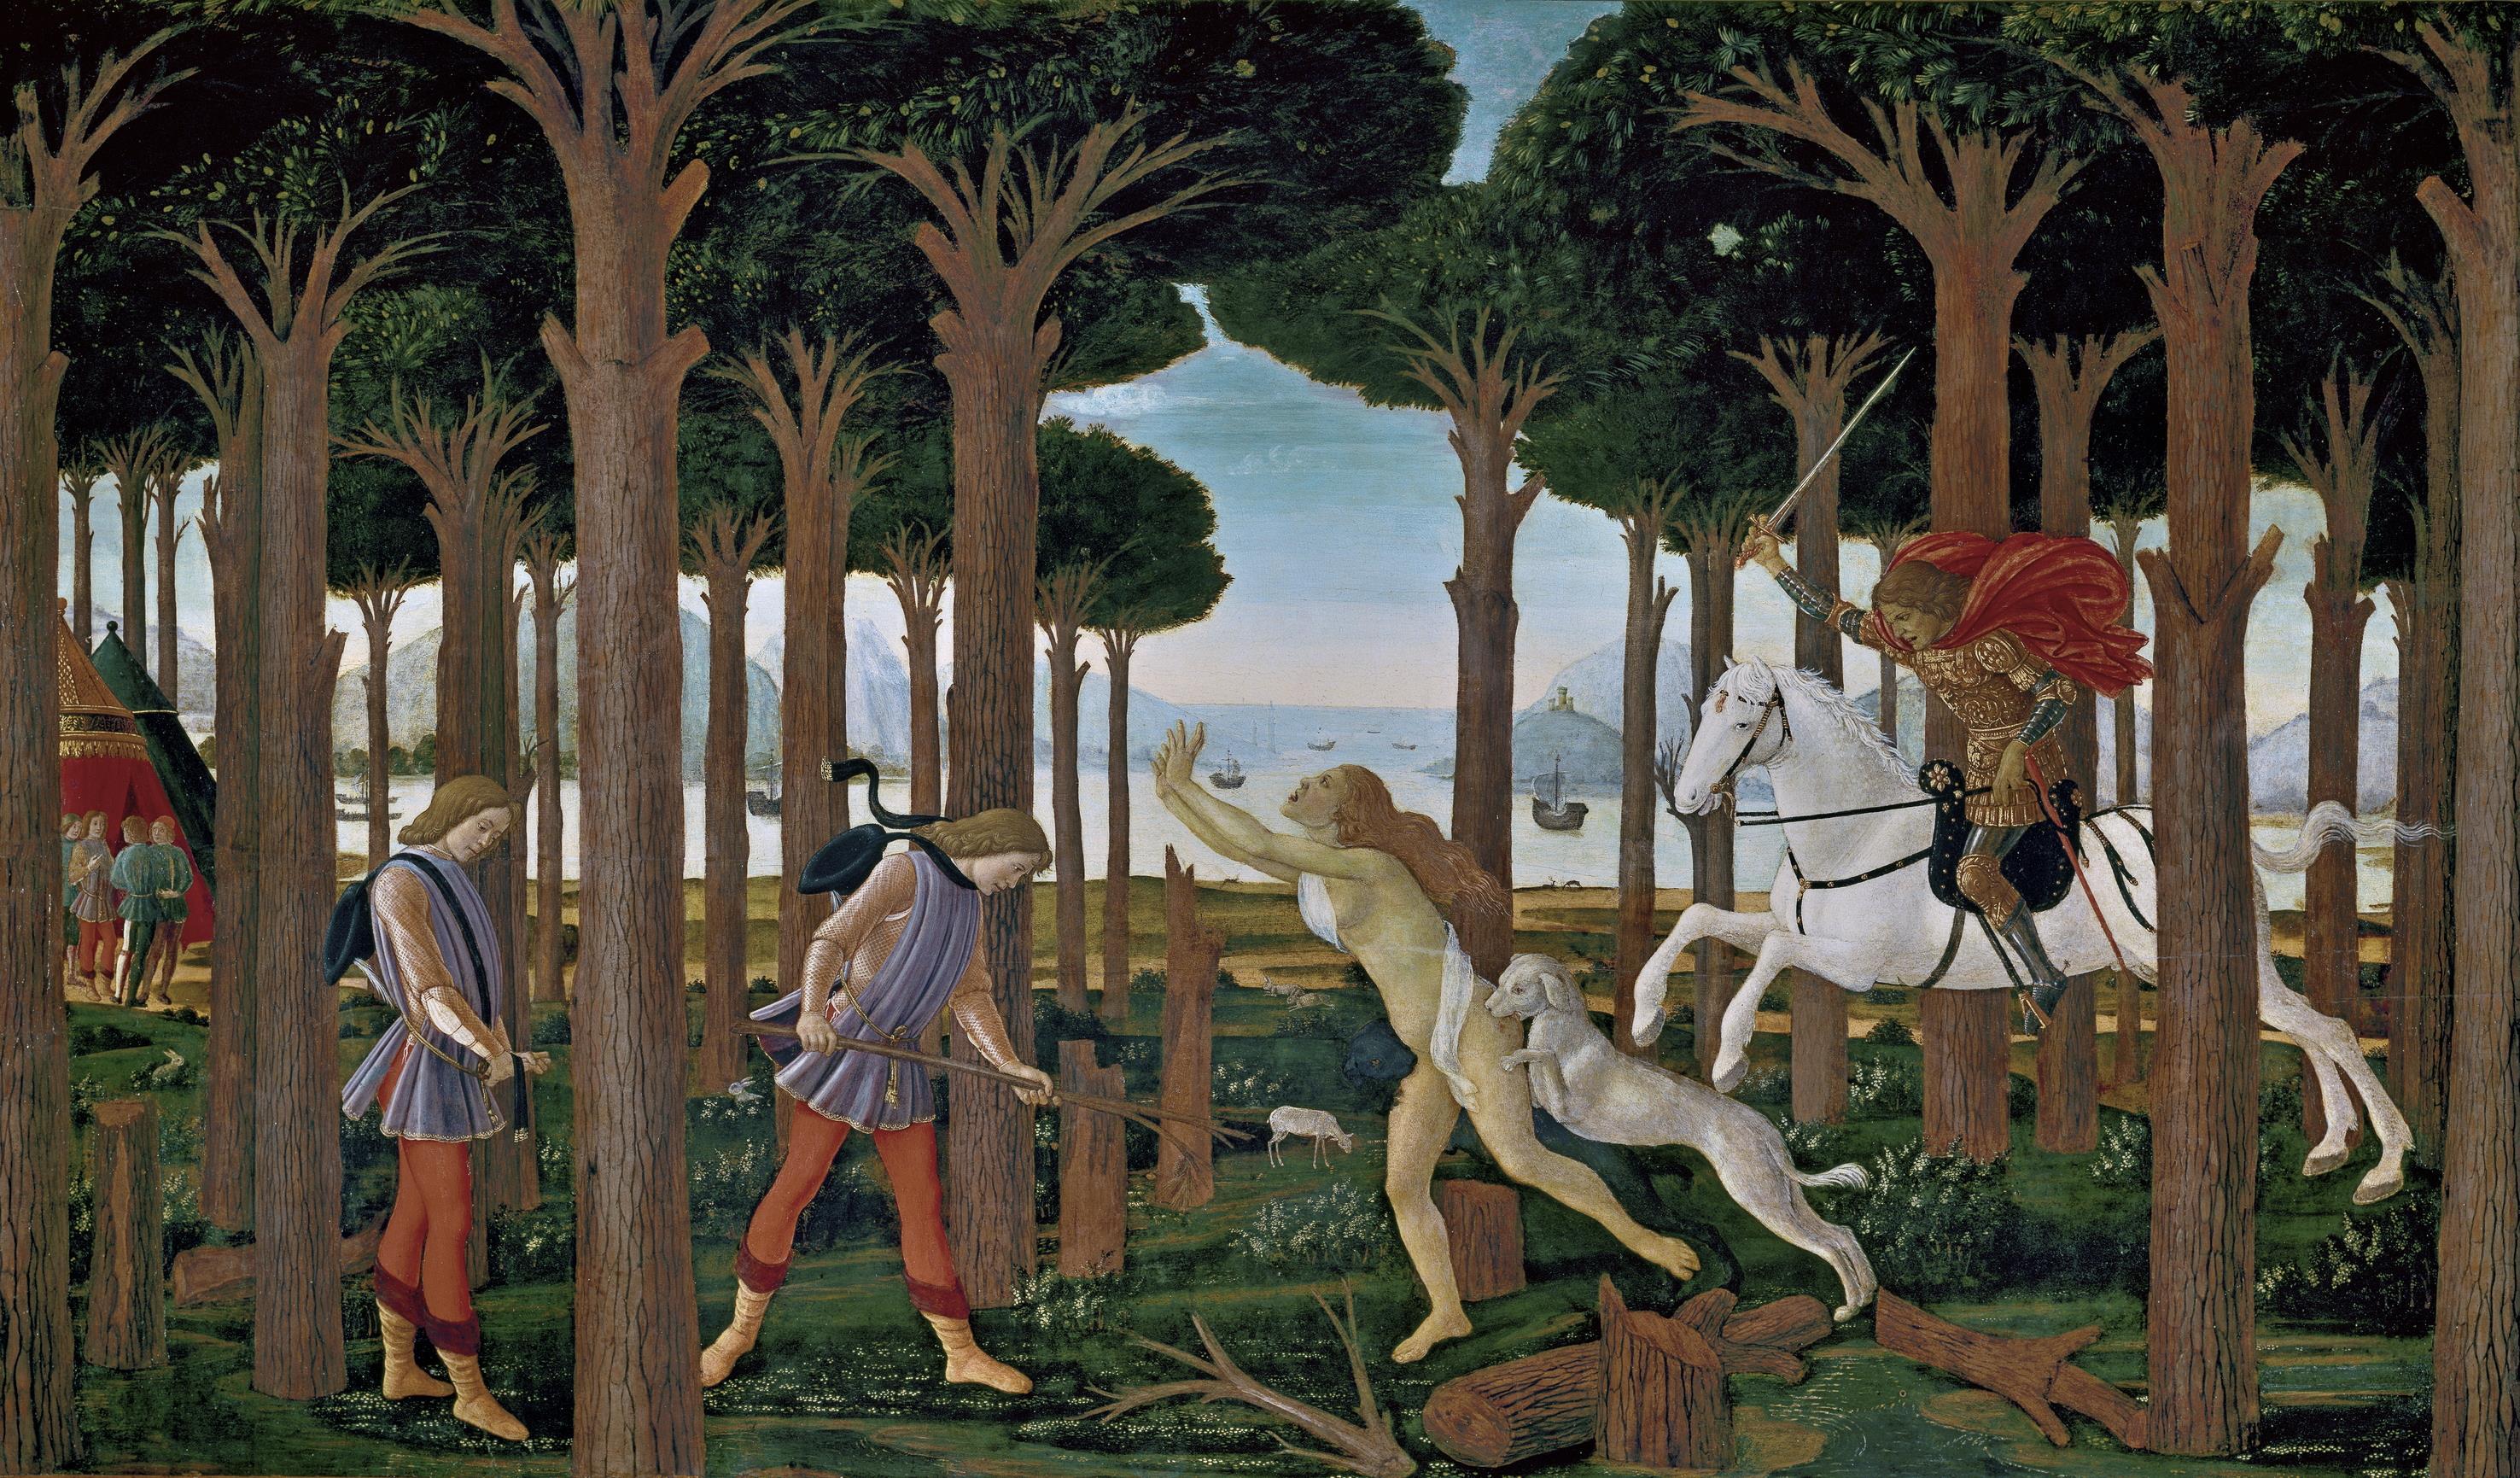 https://upload.wikimedia.org/wikipedia/commons/1/16/Botticelli_Prado_103.jpg